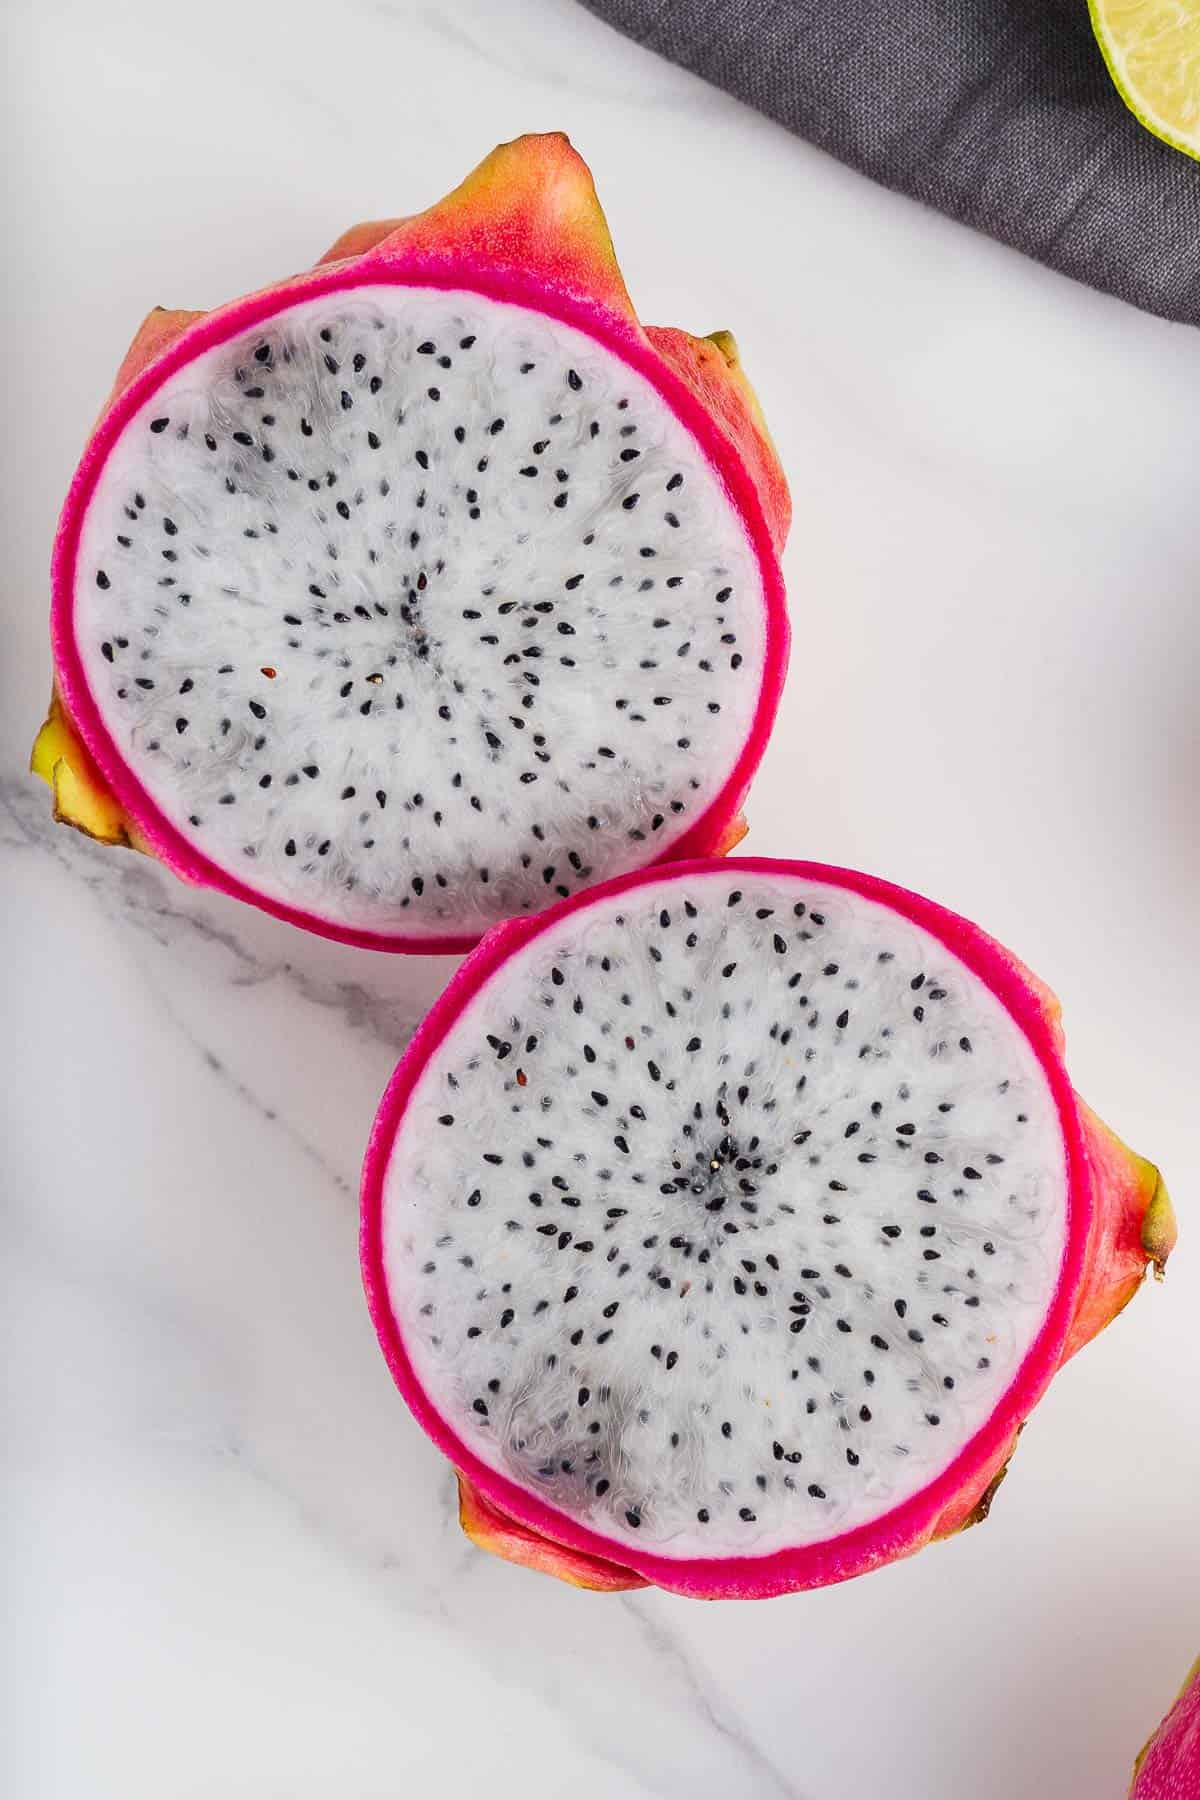 Pitahaya Fruit Cut in Half